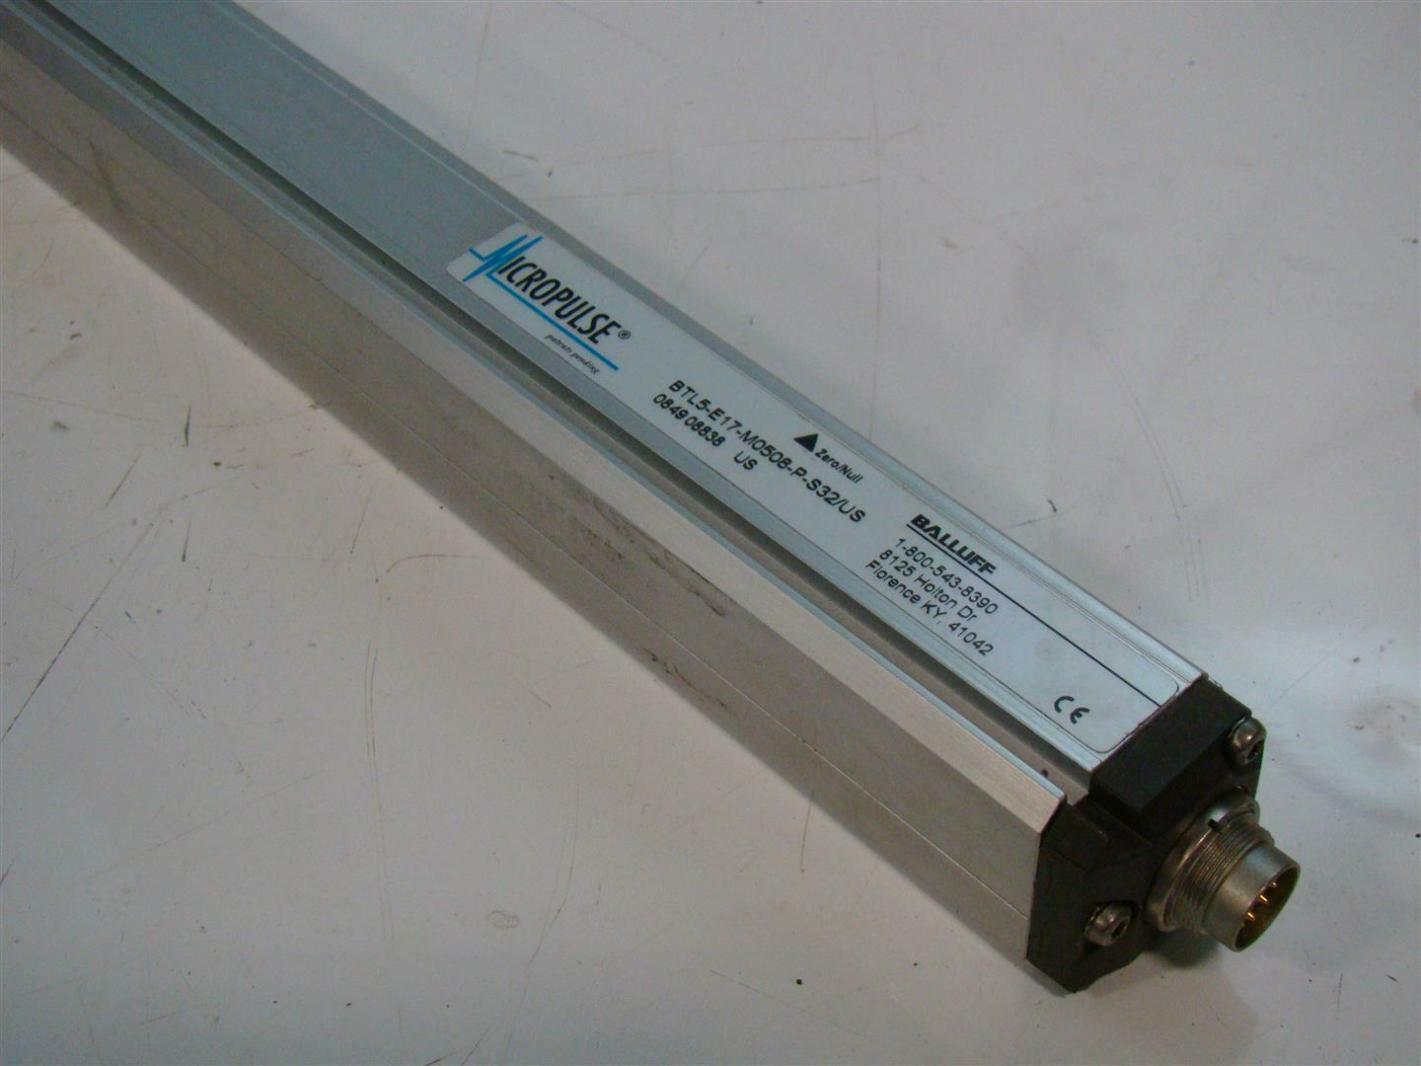 50 St 25-pol. per leiterplattenbest. a087 sub-D BARRE penna !!!